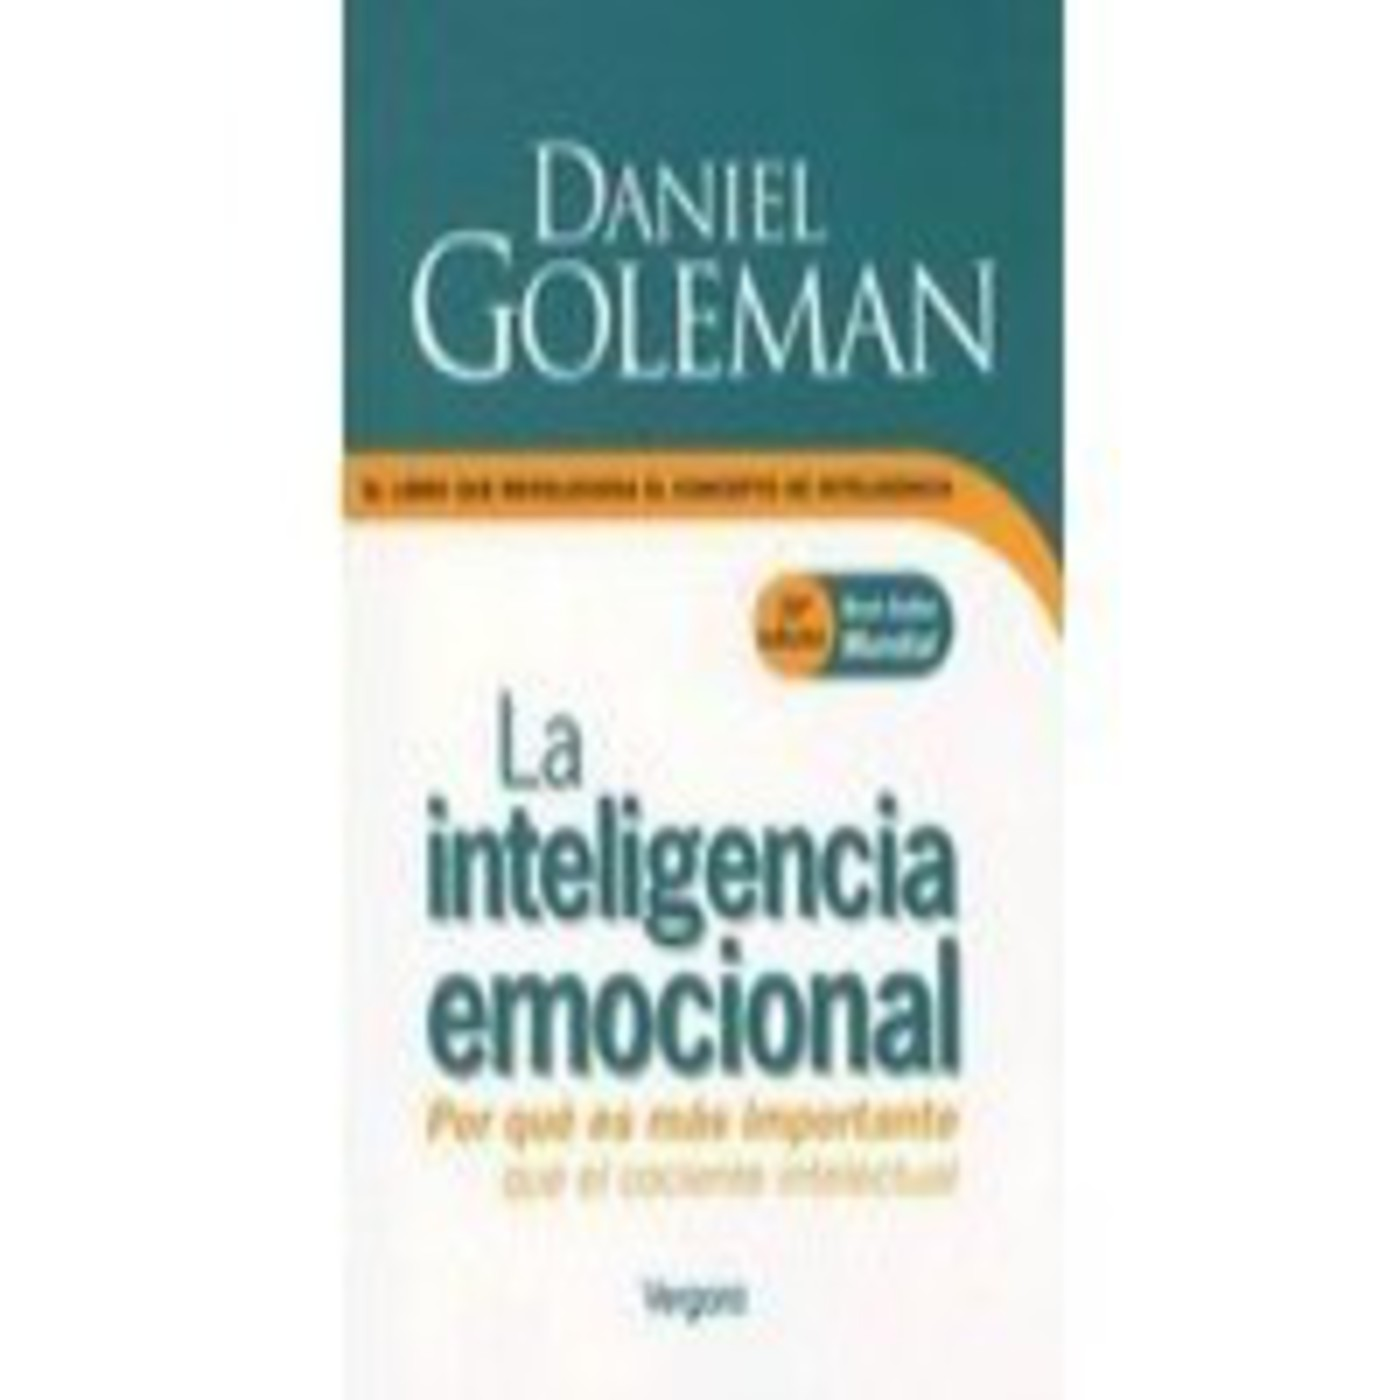 39..INTELIGENCIA EMOCIONAL, Daniel Goleman